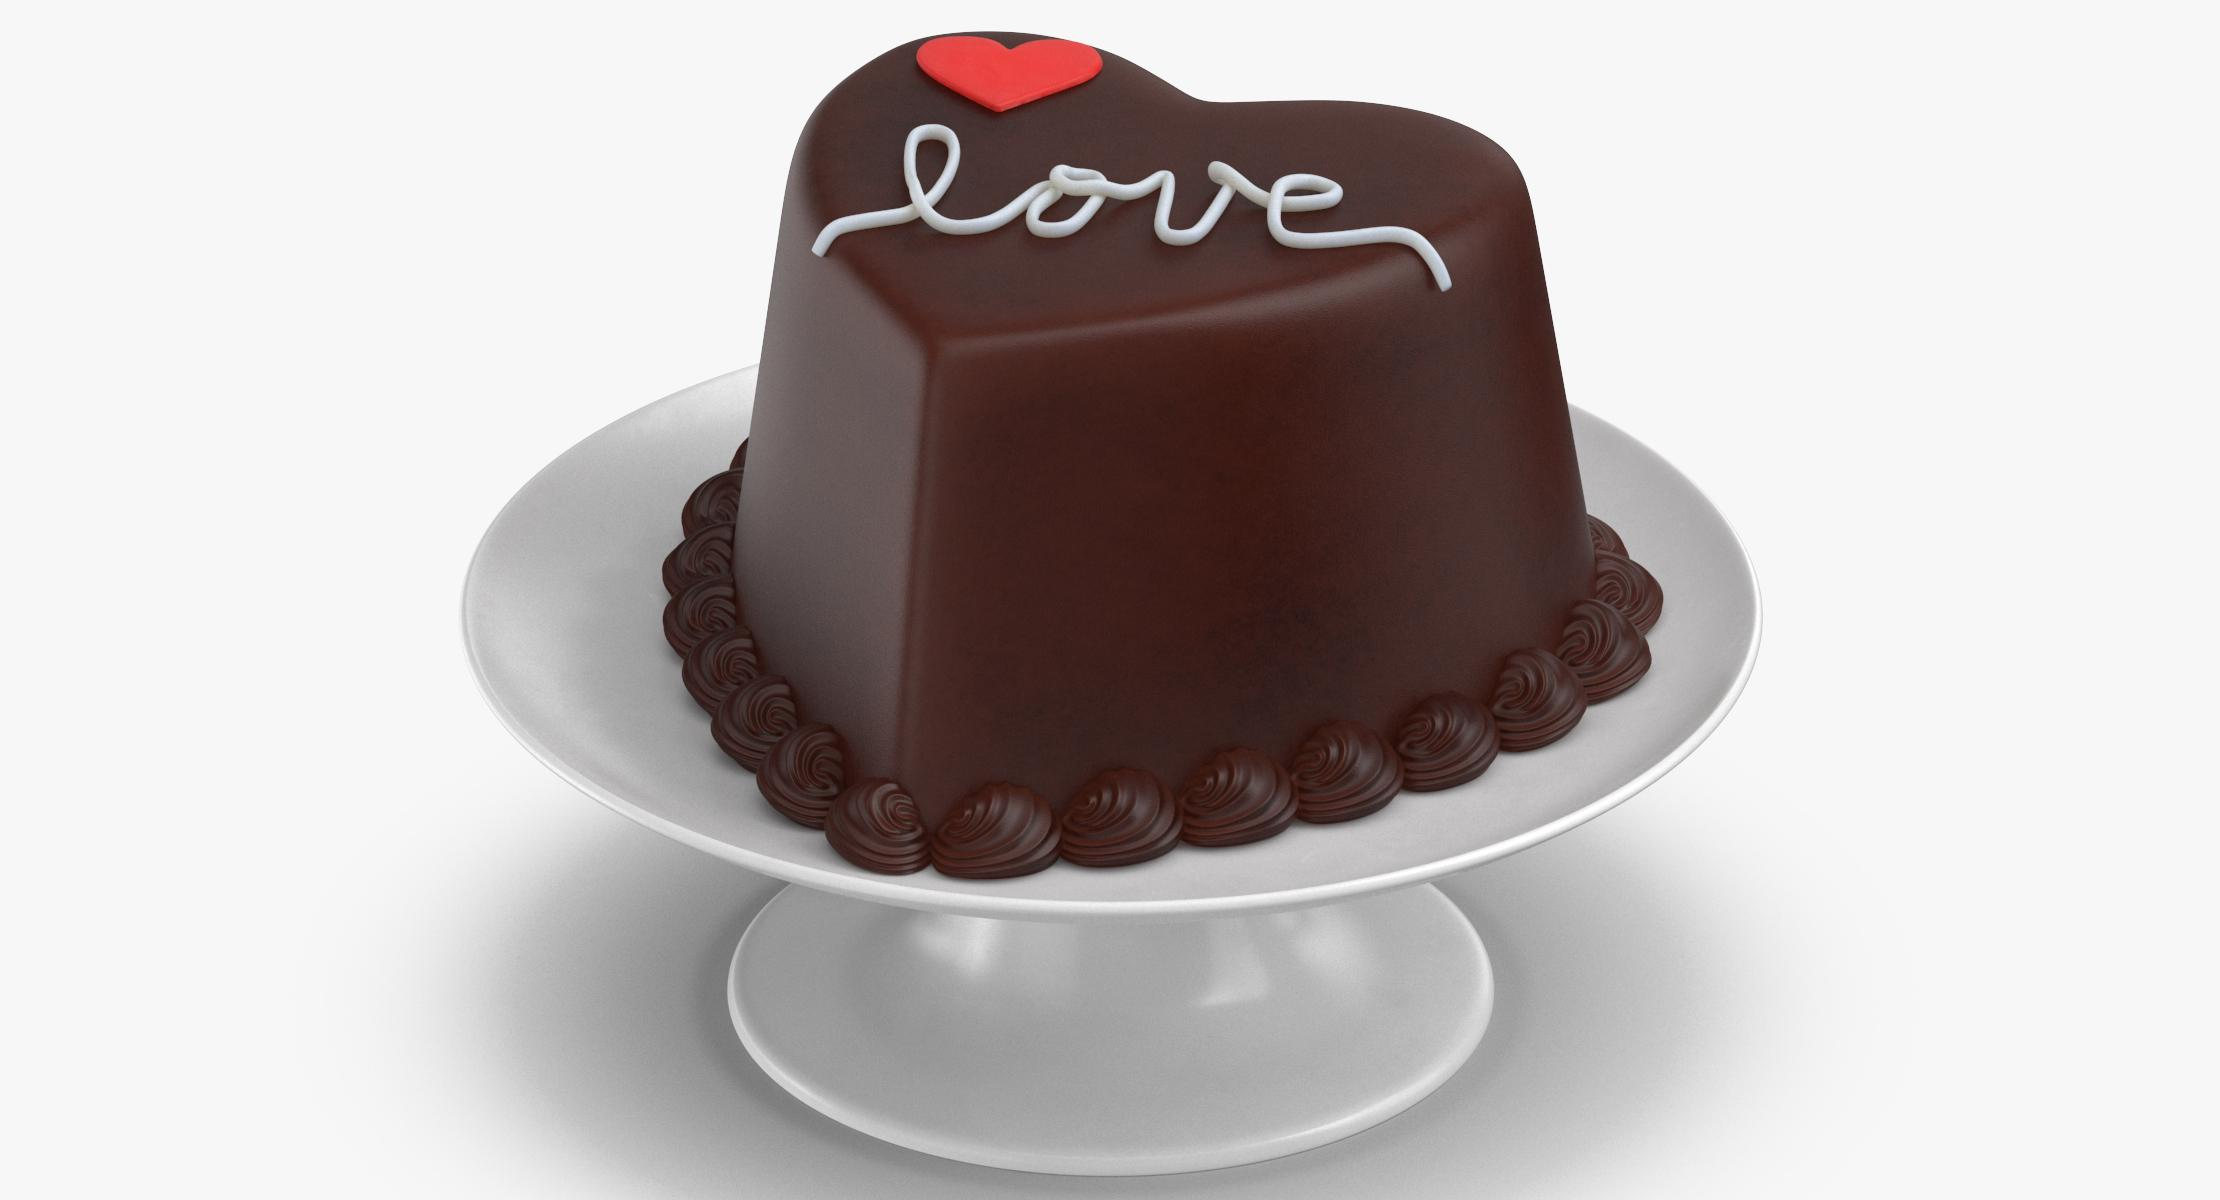 Heart Shaped Cake 02 - reel 1